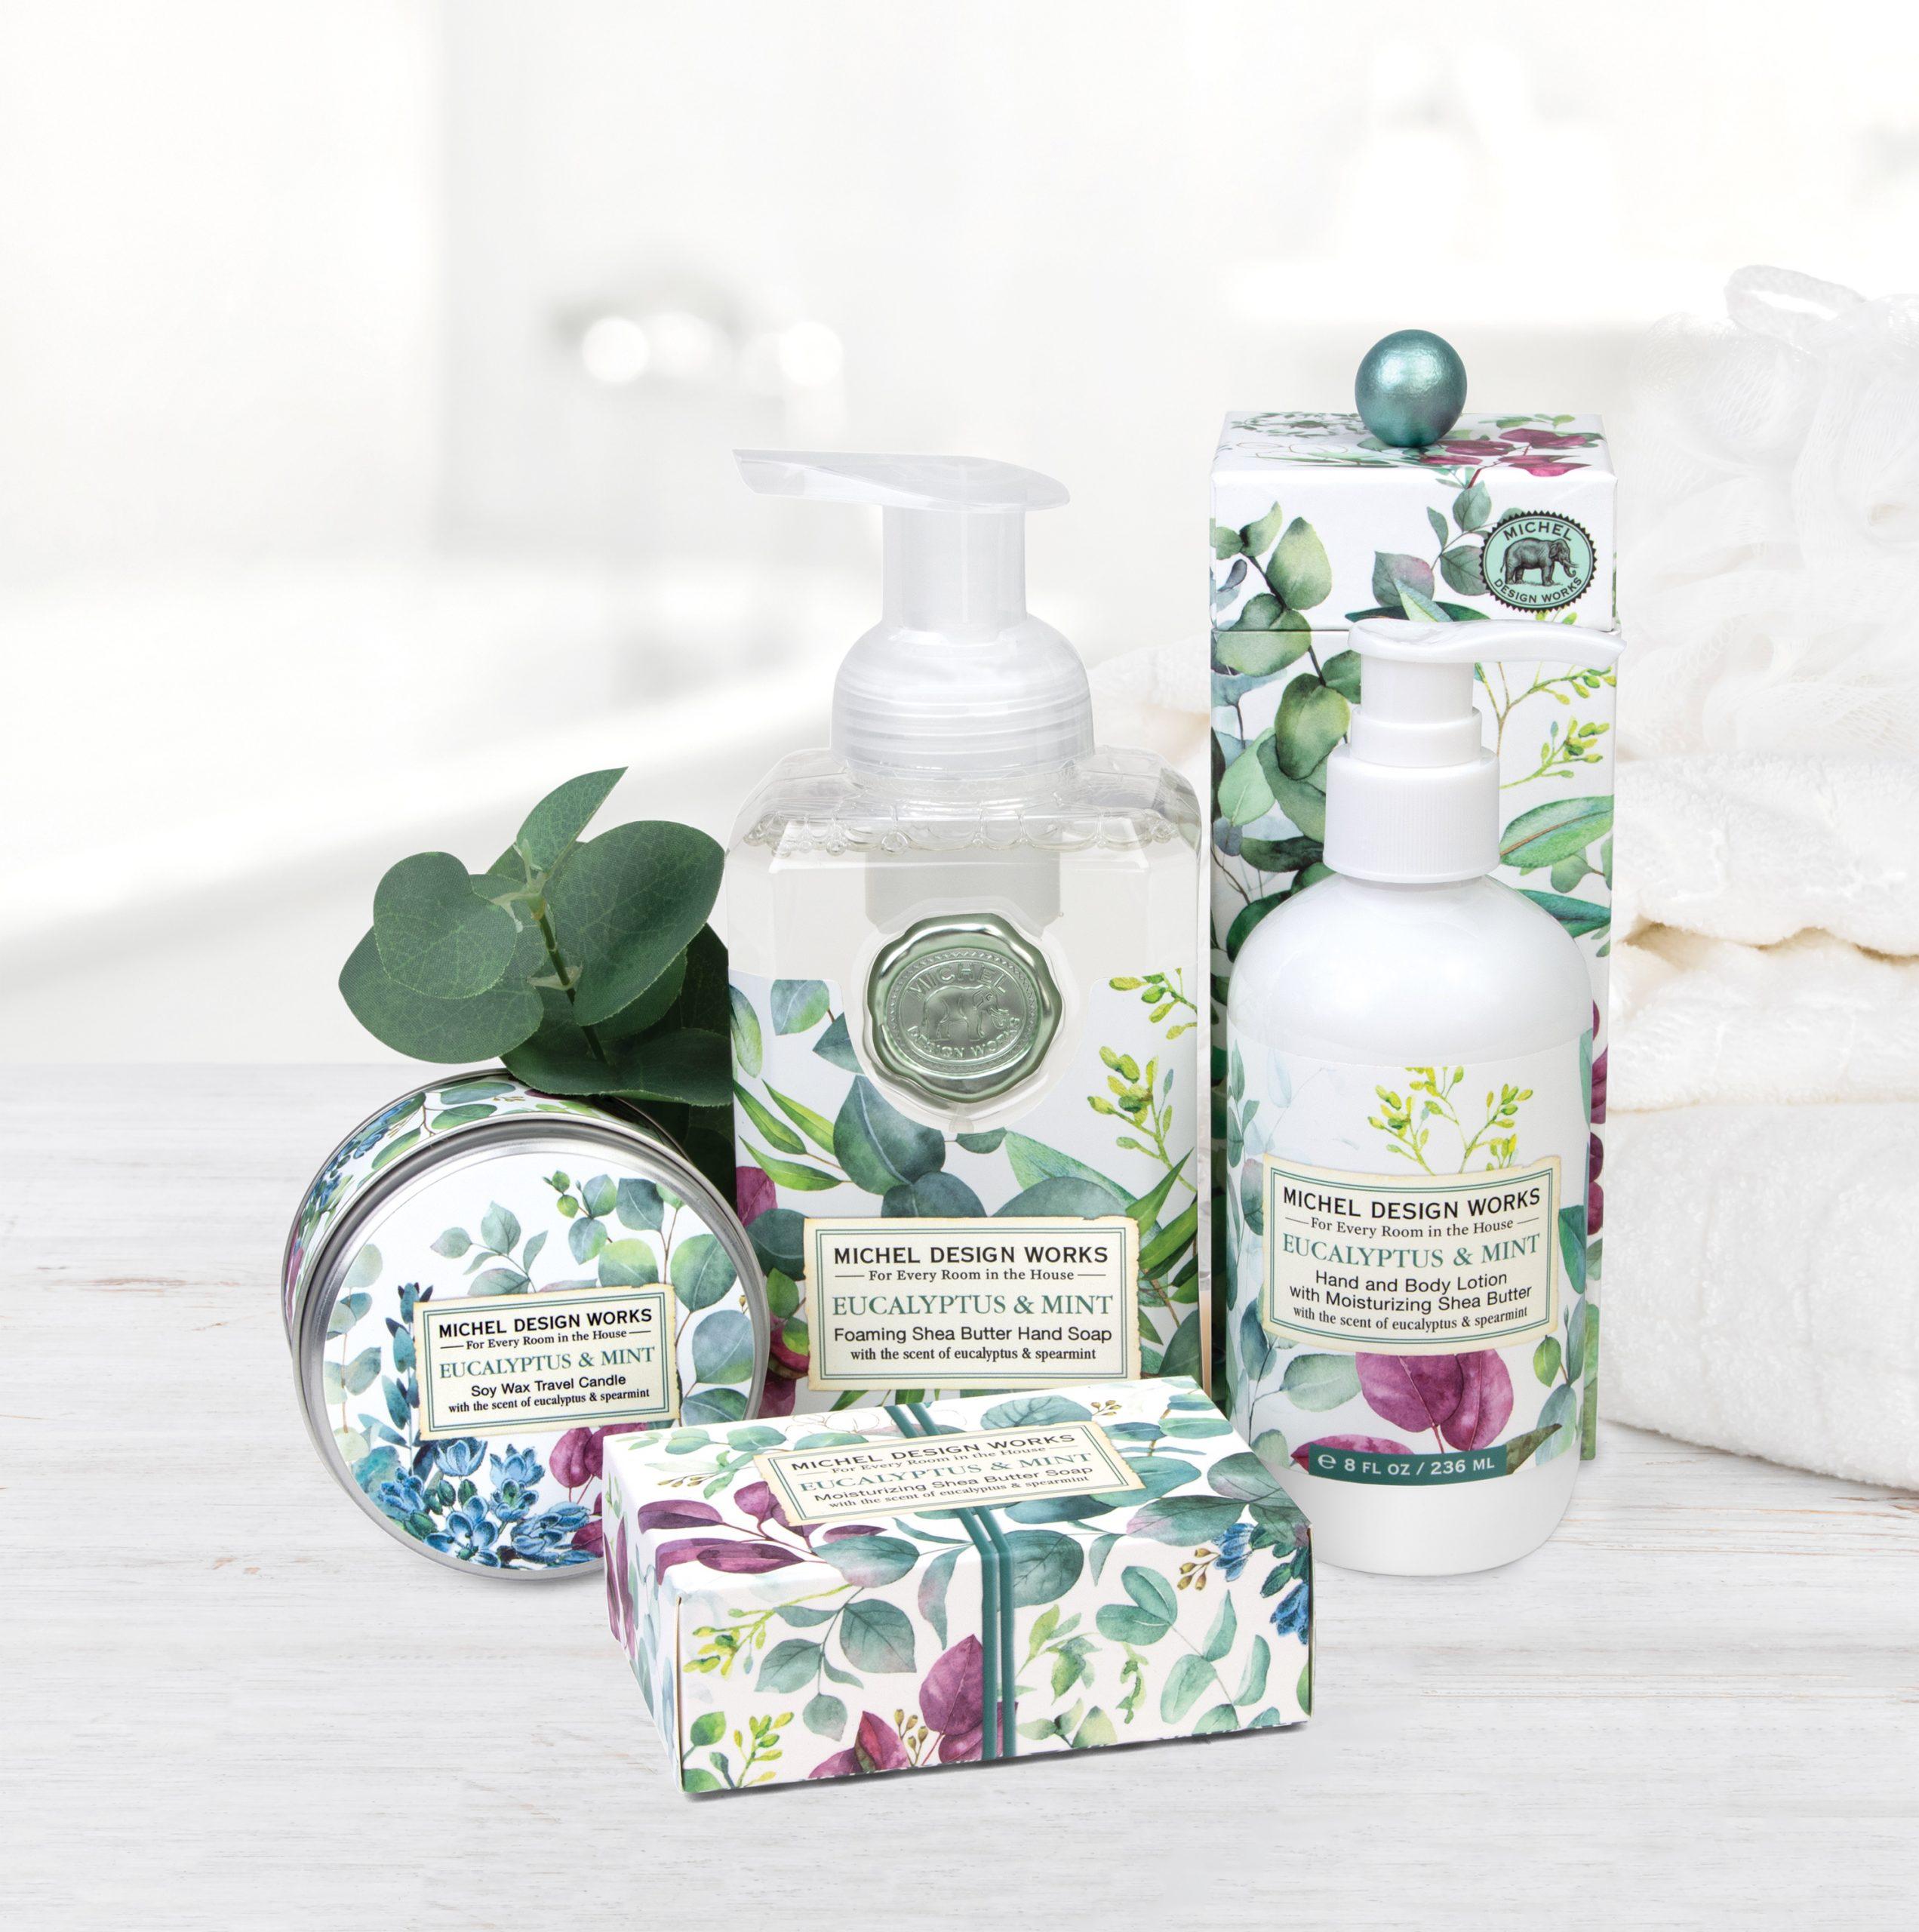 Eucalyptus & Mint - Michel Design Works